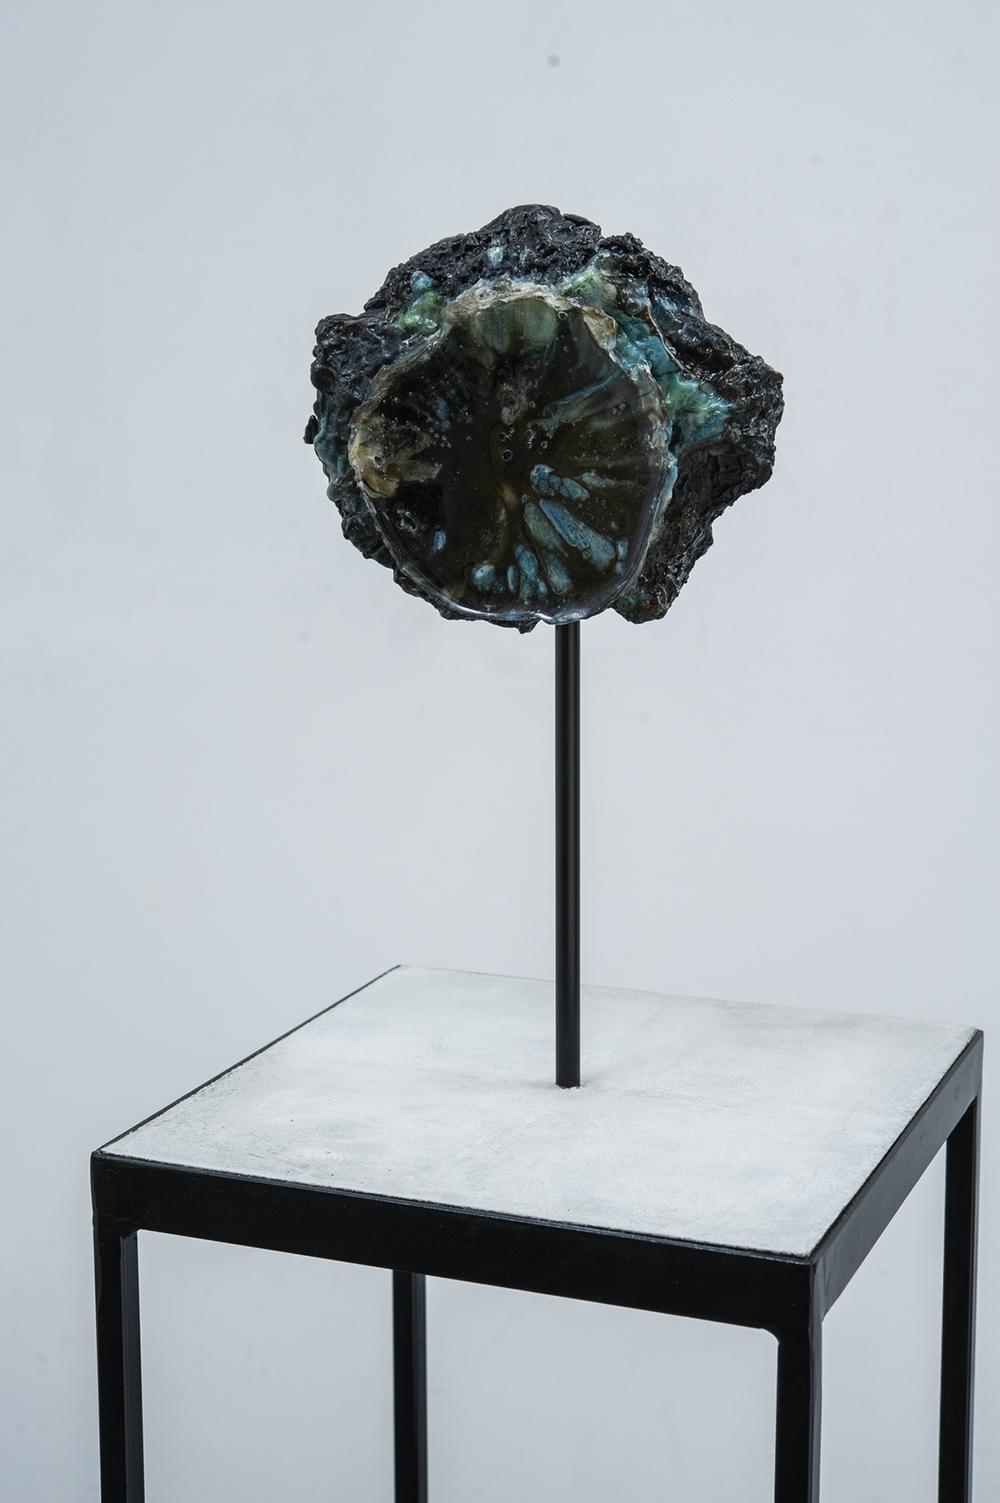 Problematica (Foil Geode)